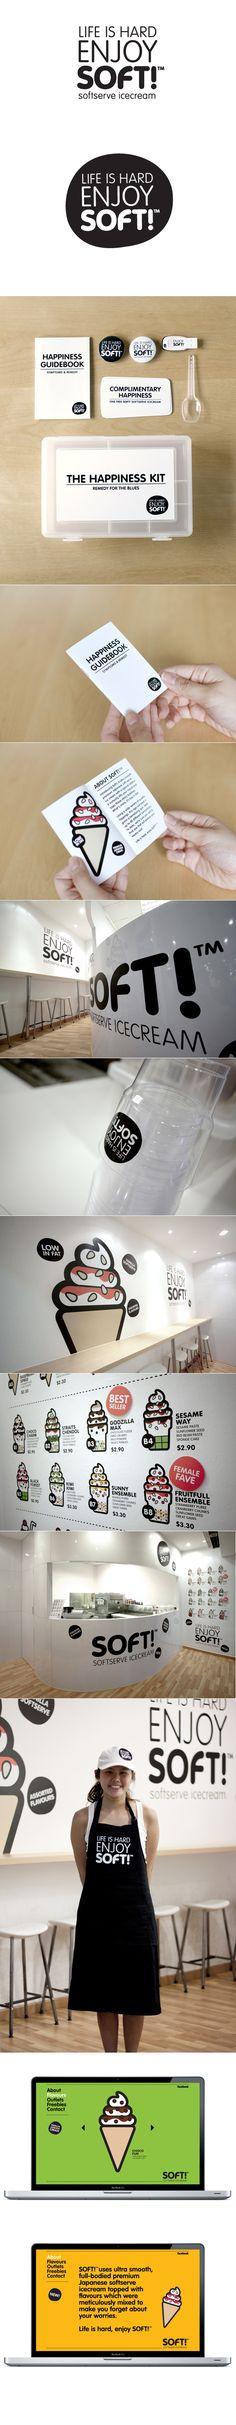 SoftTM branding by Bravo Company